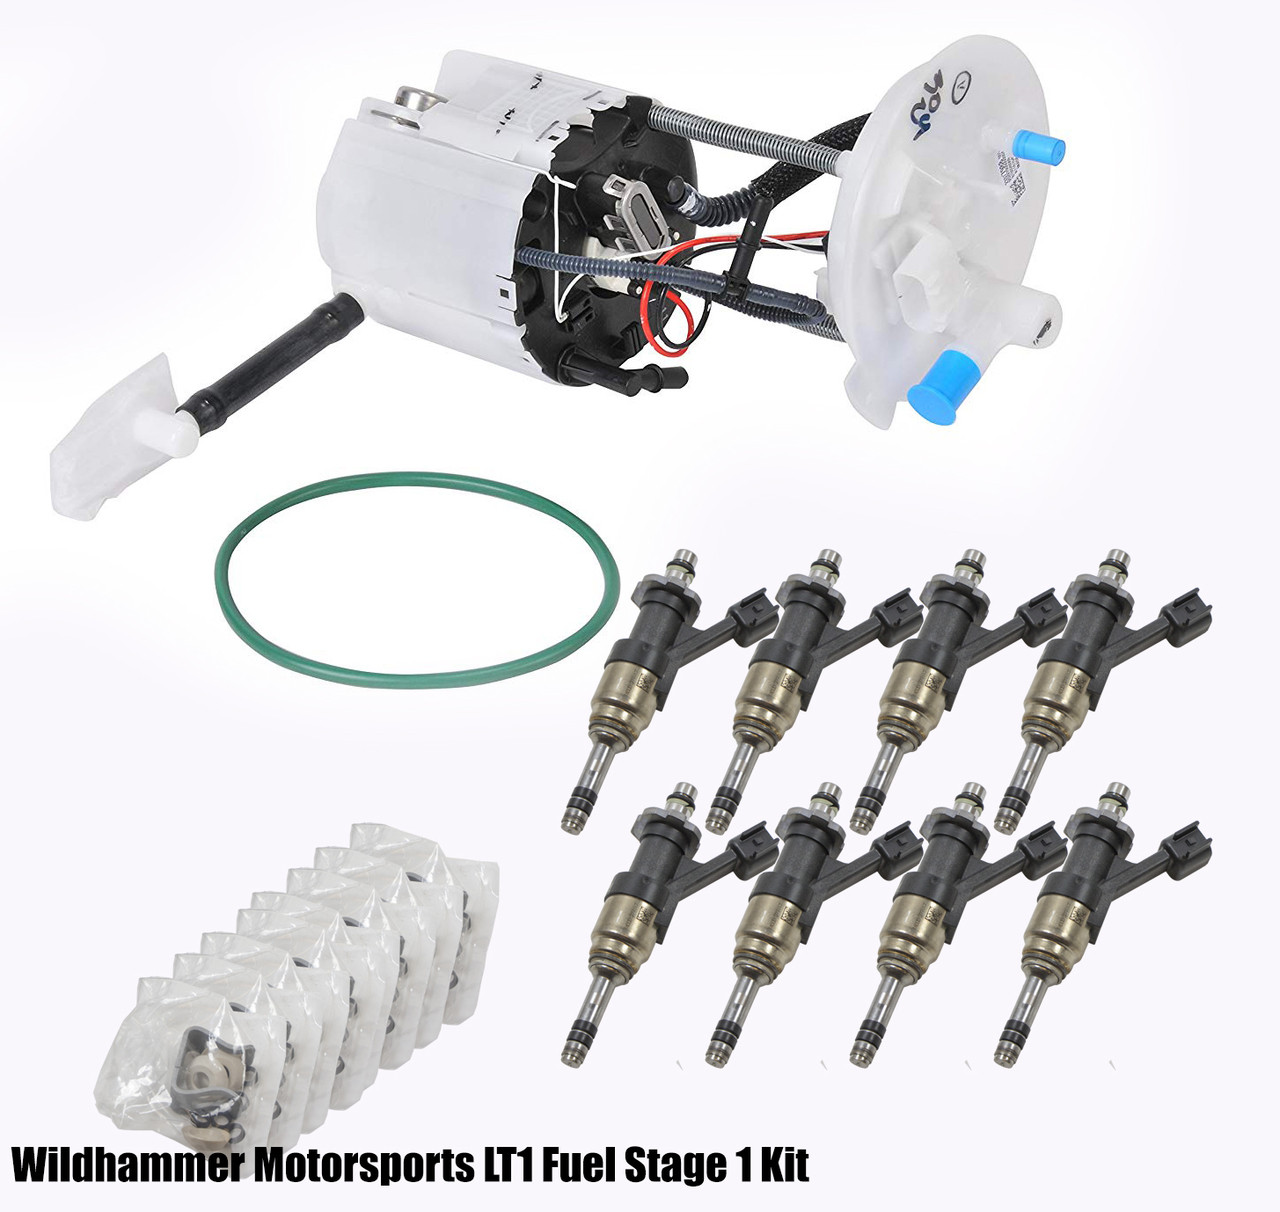 Camaro LT1 Wildhammer Edition, Fuel Stage 1 Kit  - General Motors